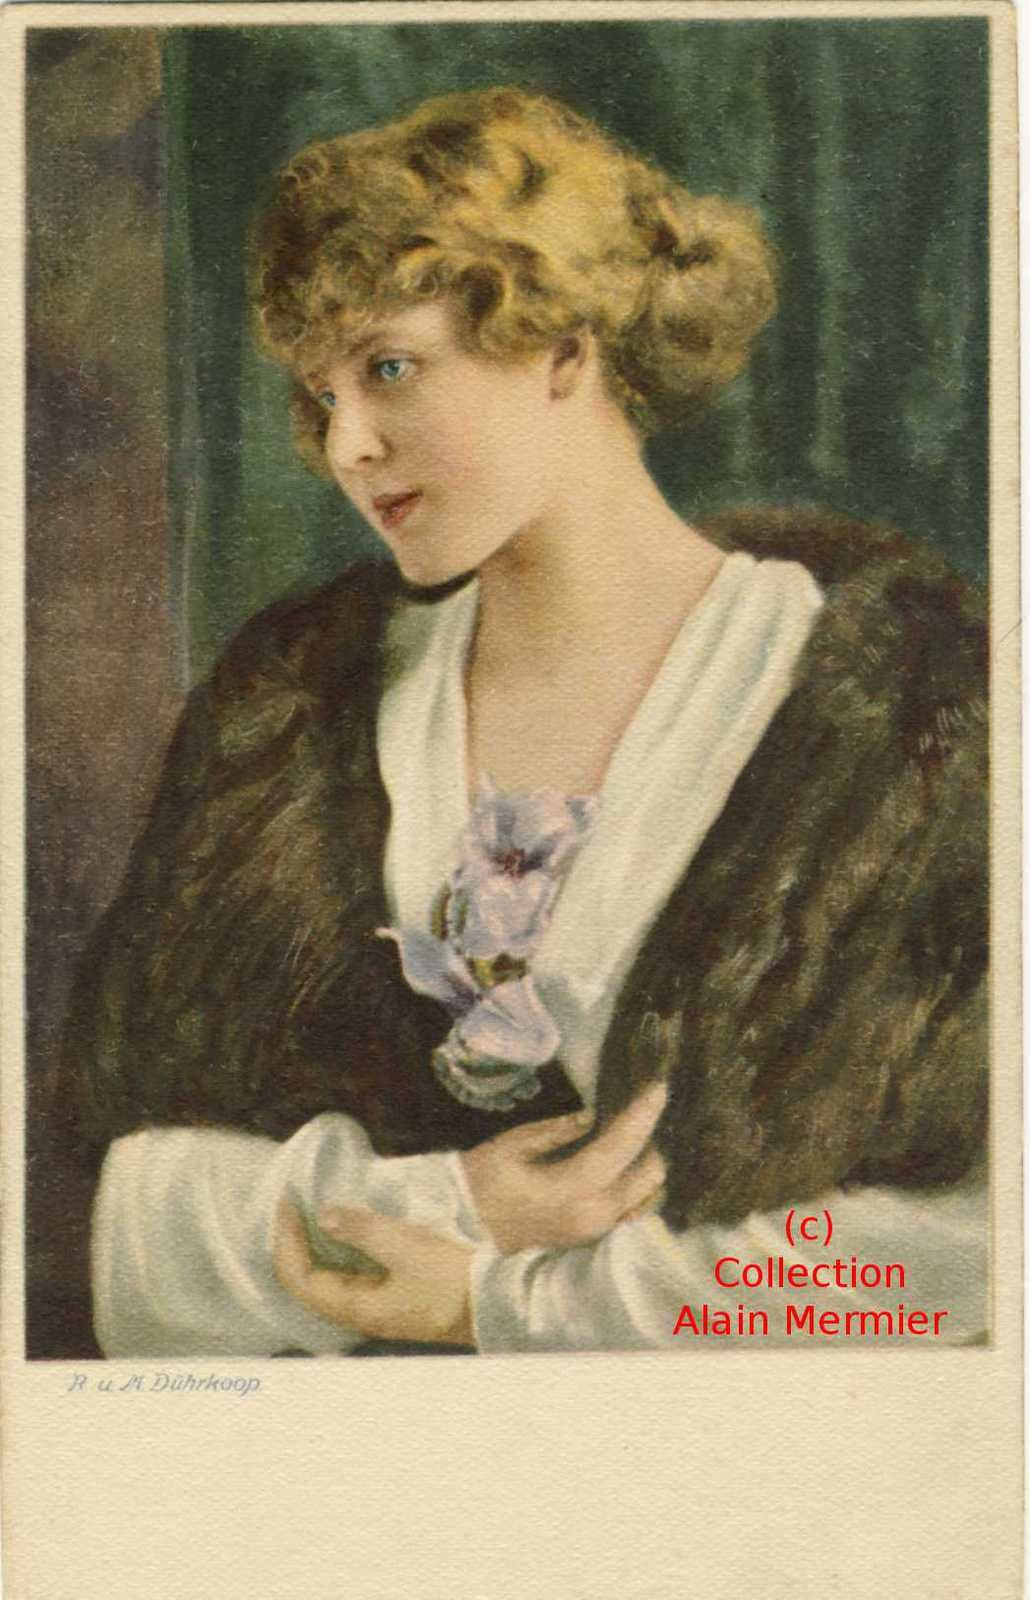 Iris -3625- R und M DÜHRKOOP : portrait de femme. Allemagne.